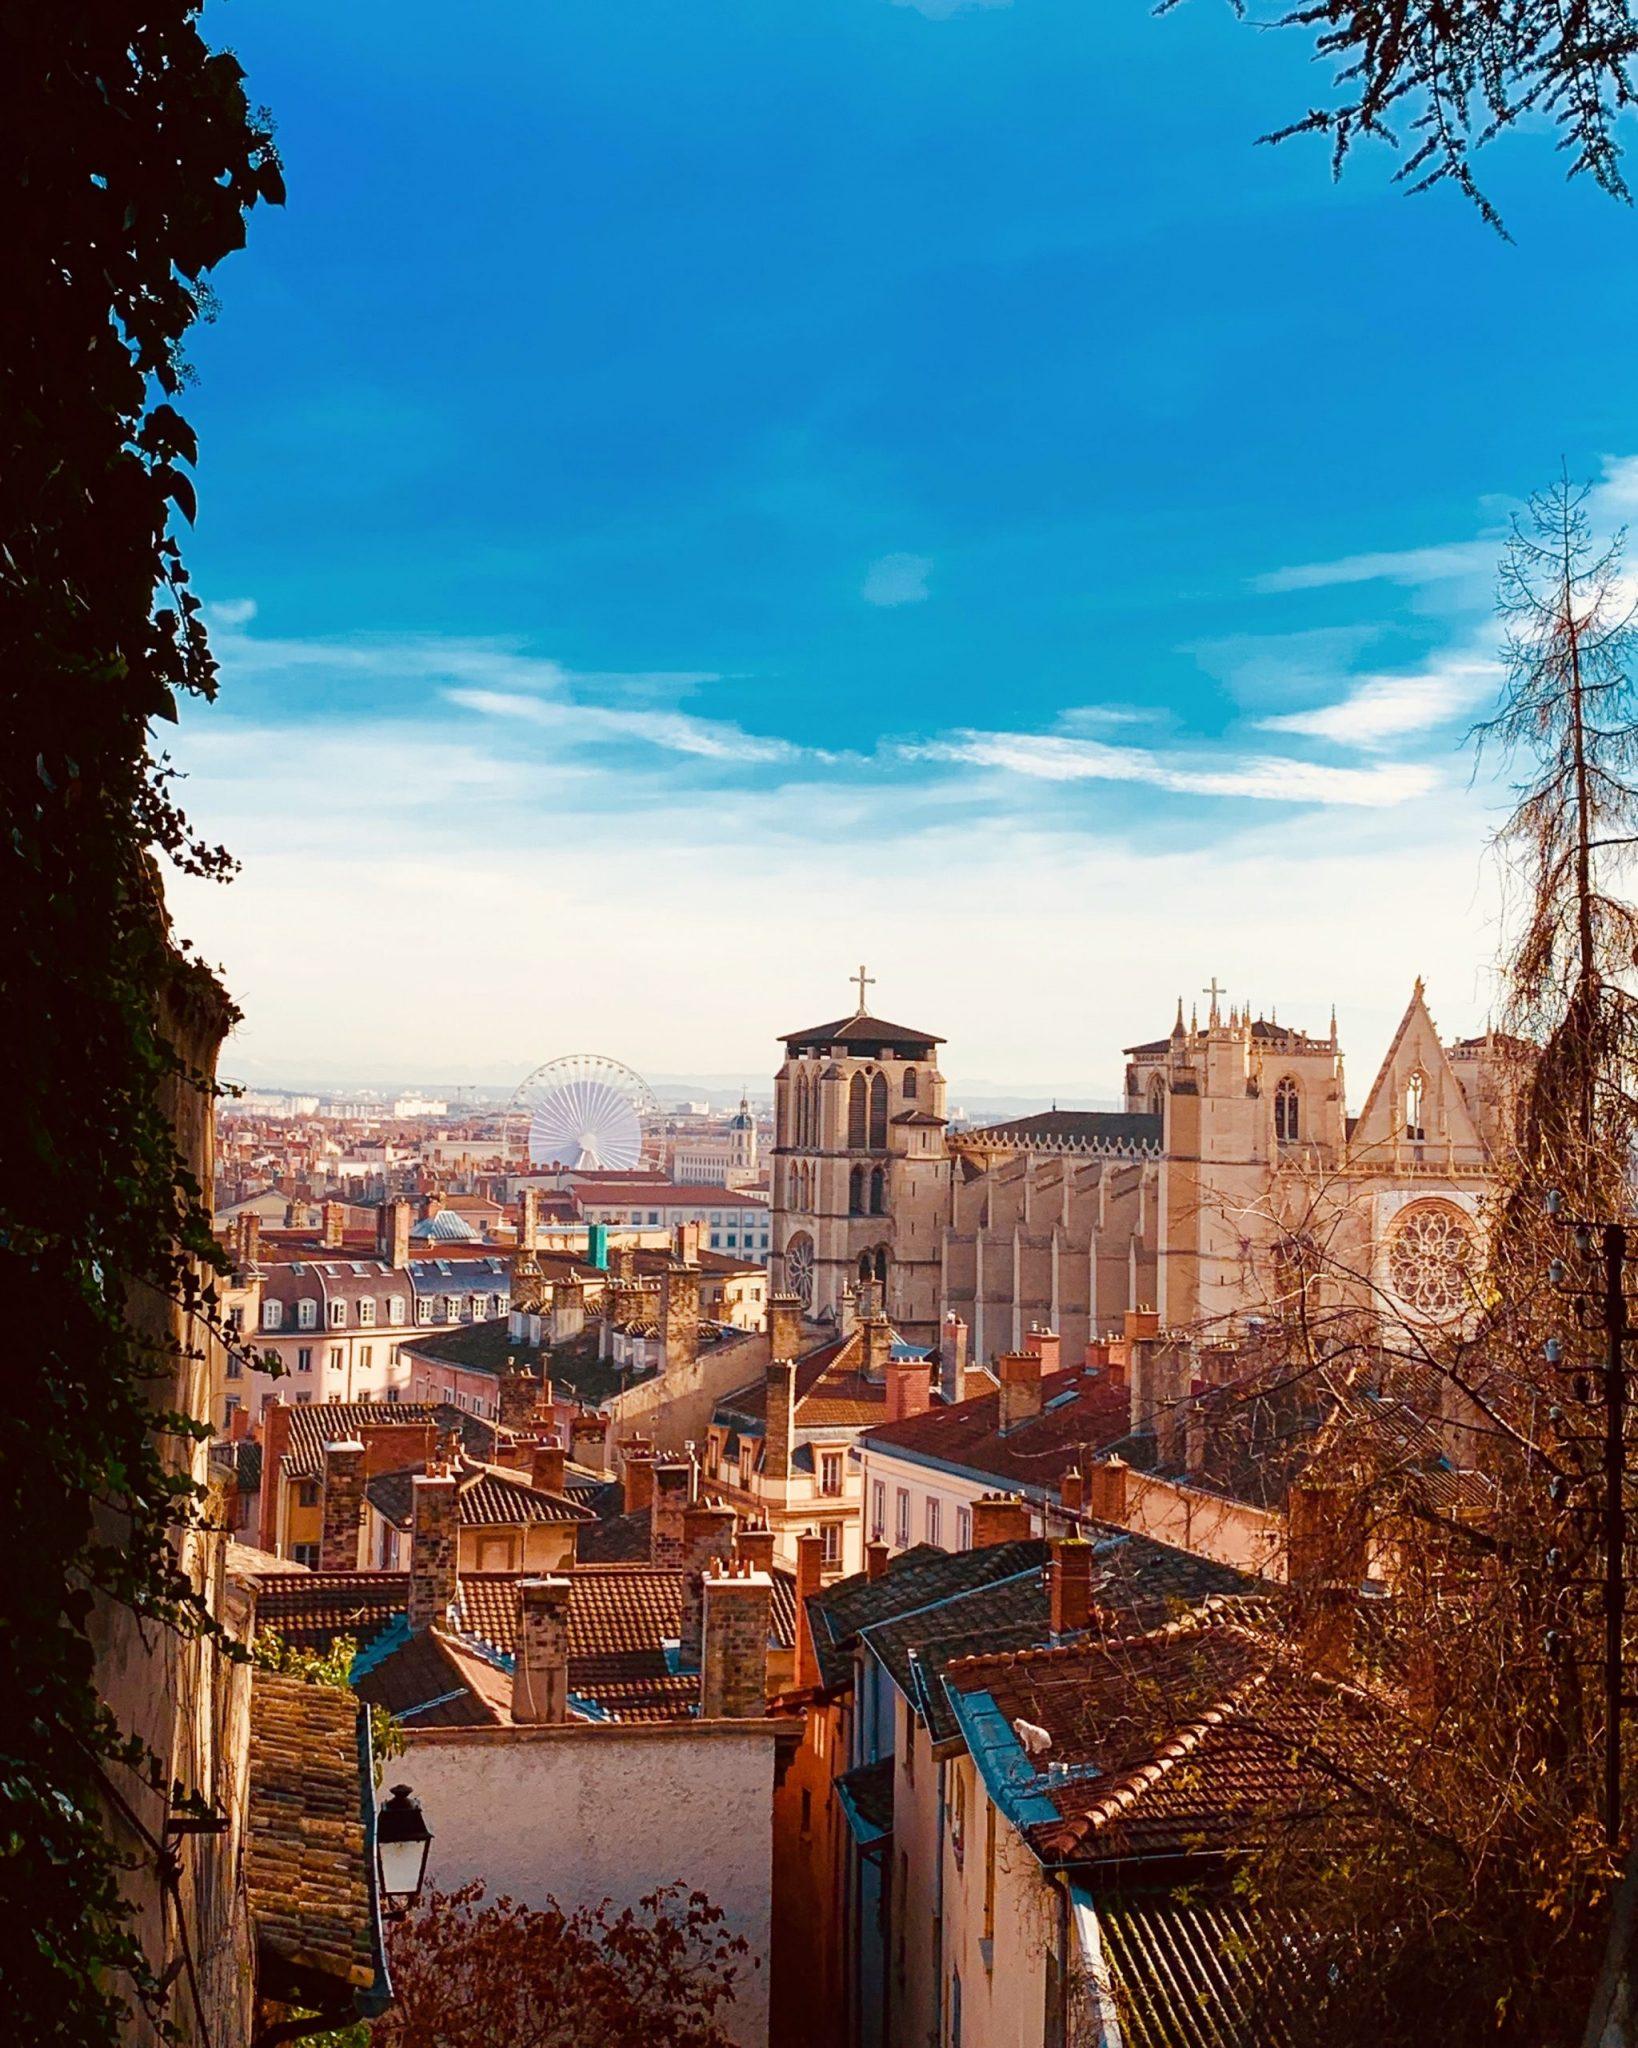 City of Lyon